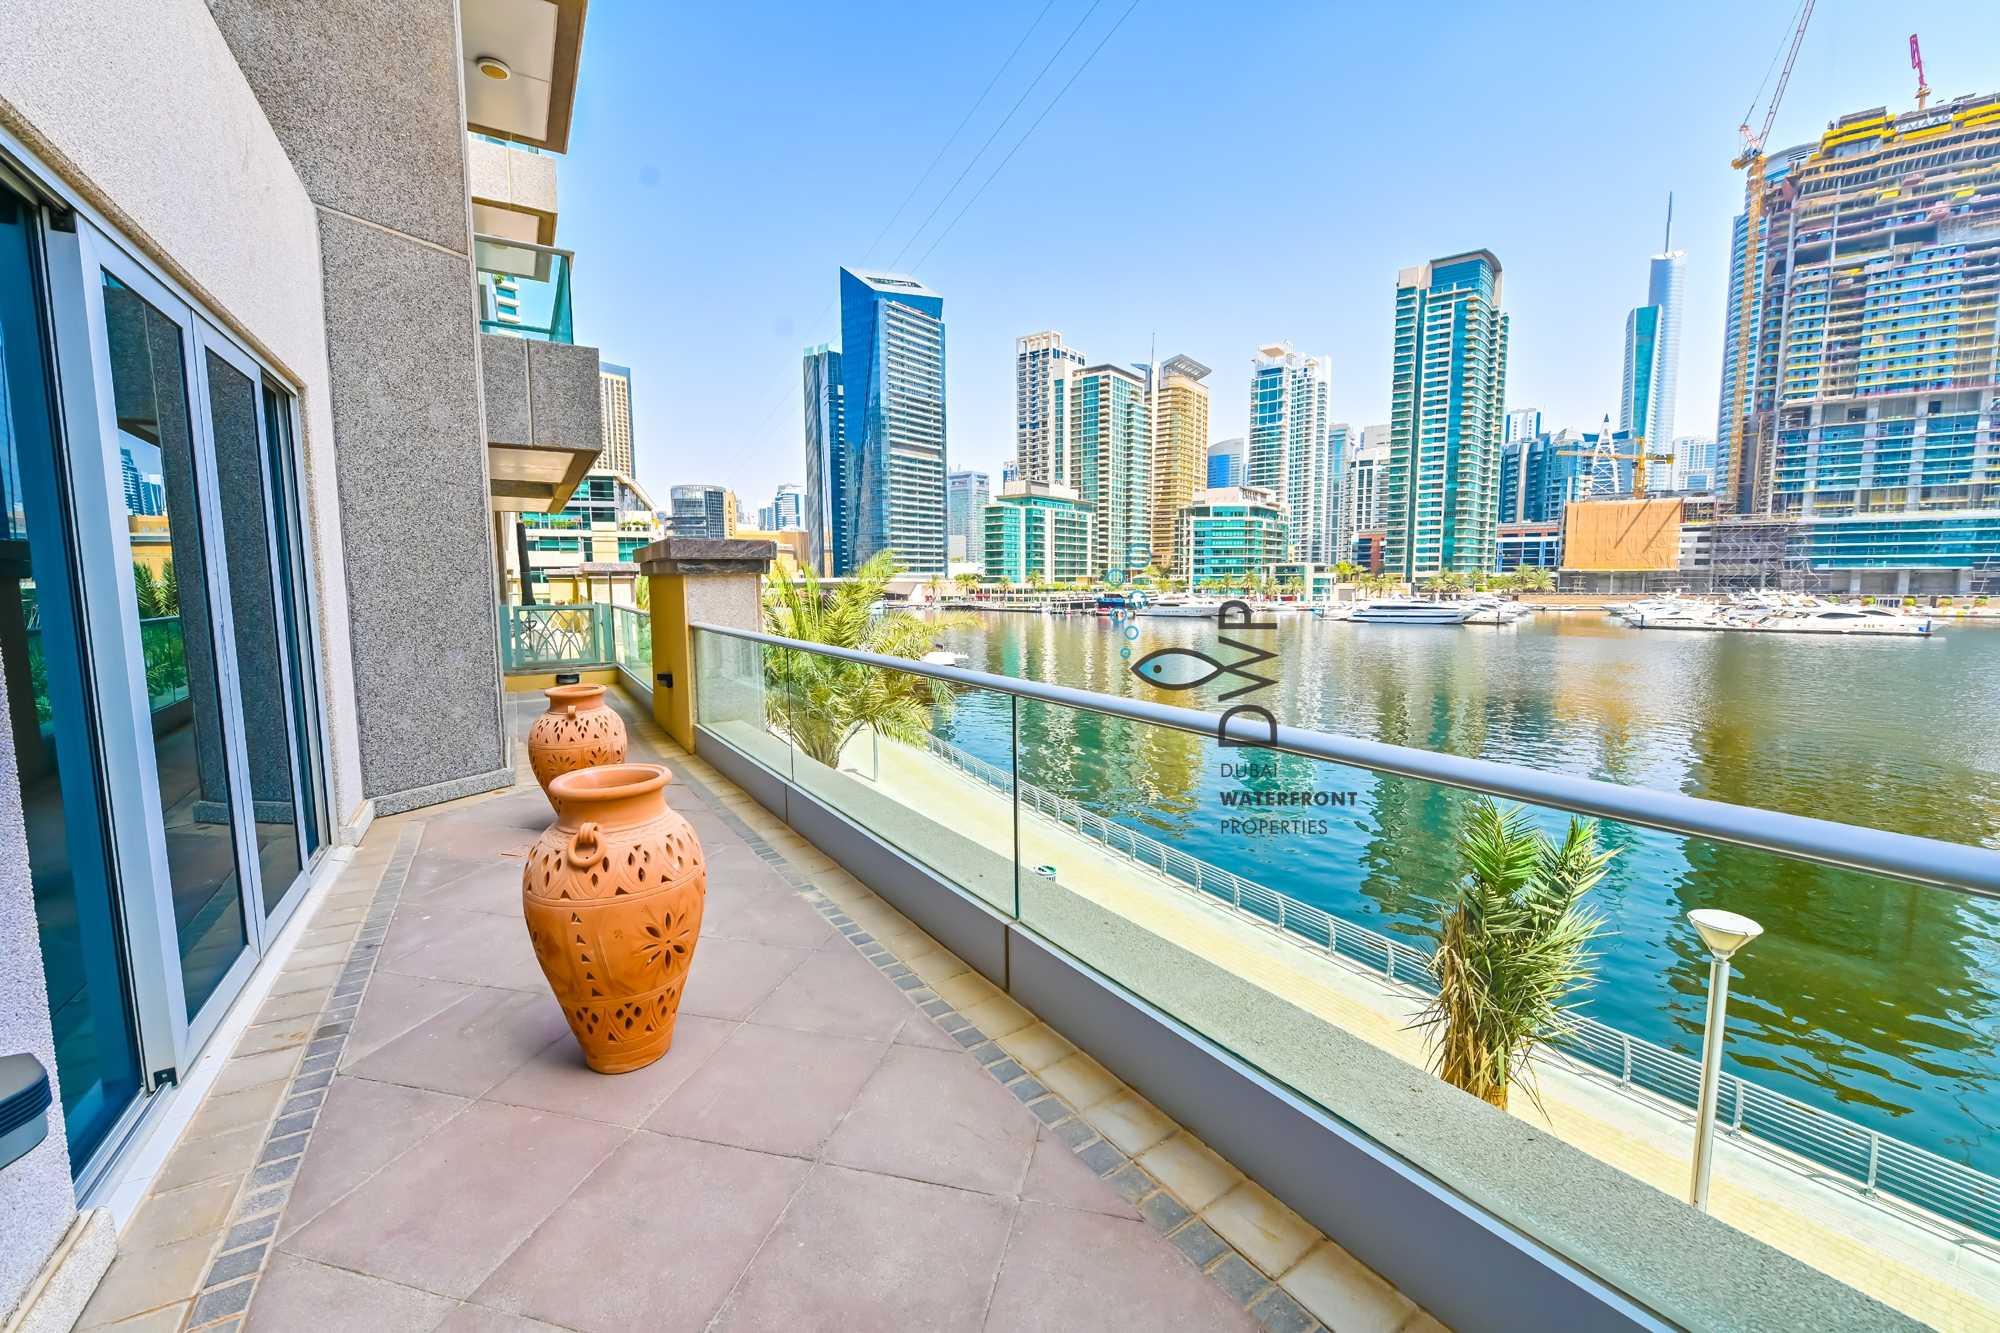 Genuine Listing! Stunning 1BR | Marina Promenade -  Paloma Tower |  Marina Facing